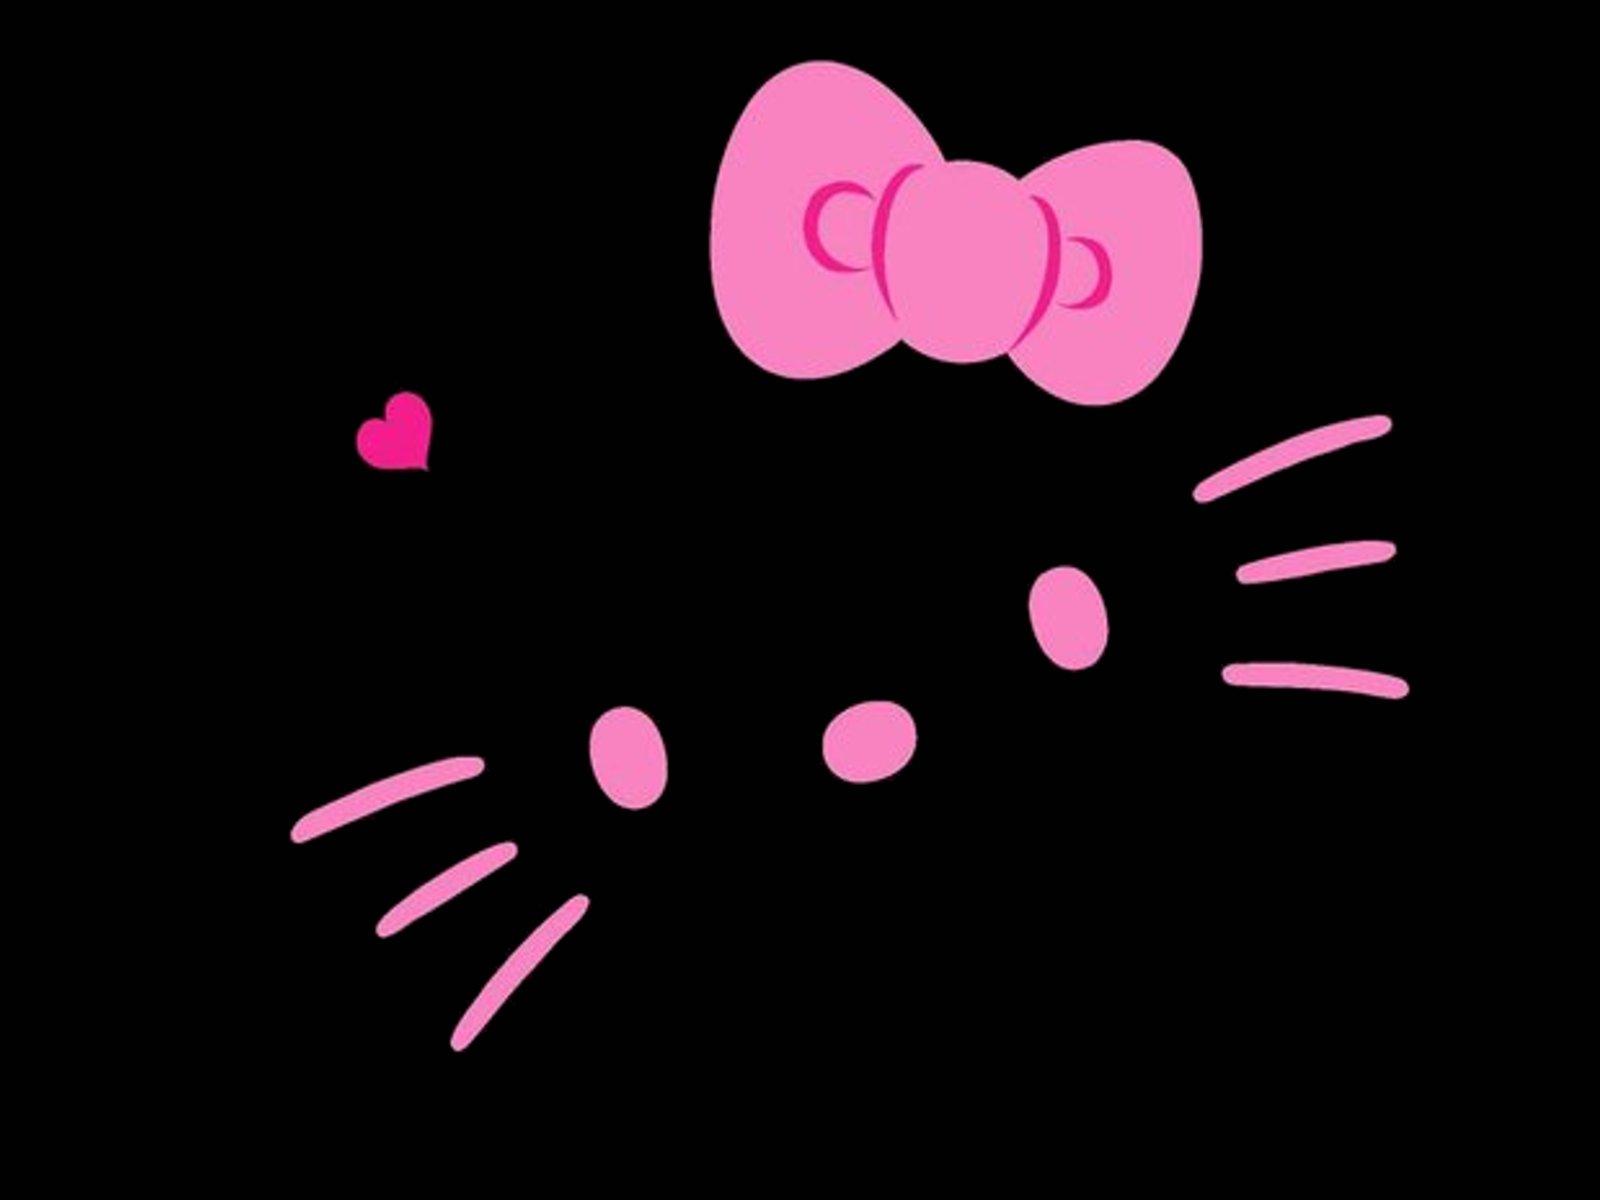 e25a1e709 Hello Kitty Cute Wallpaper 1600x1200 Full HD Wallpapers 1600x1200